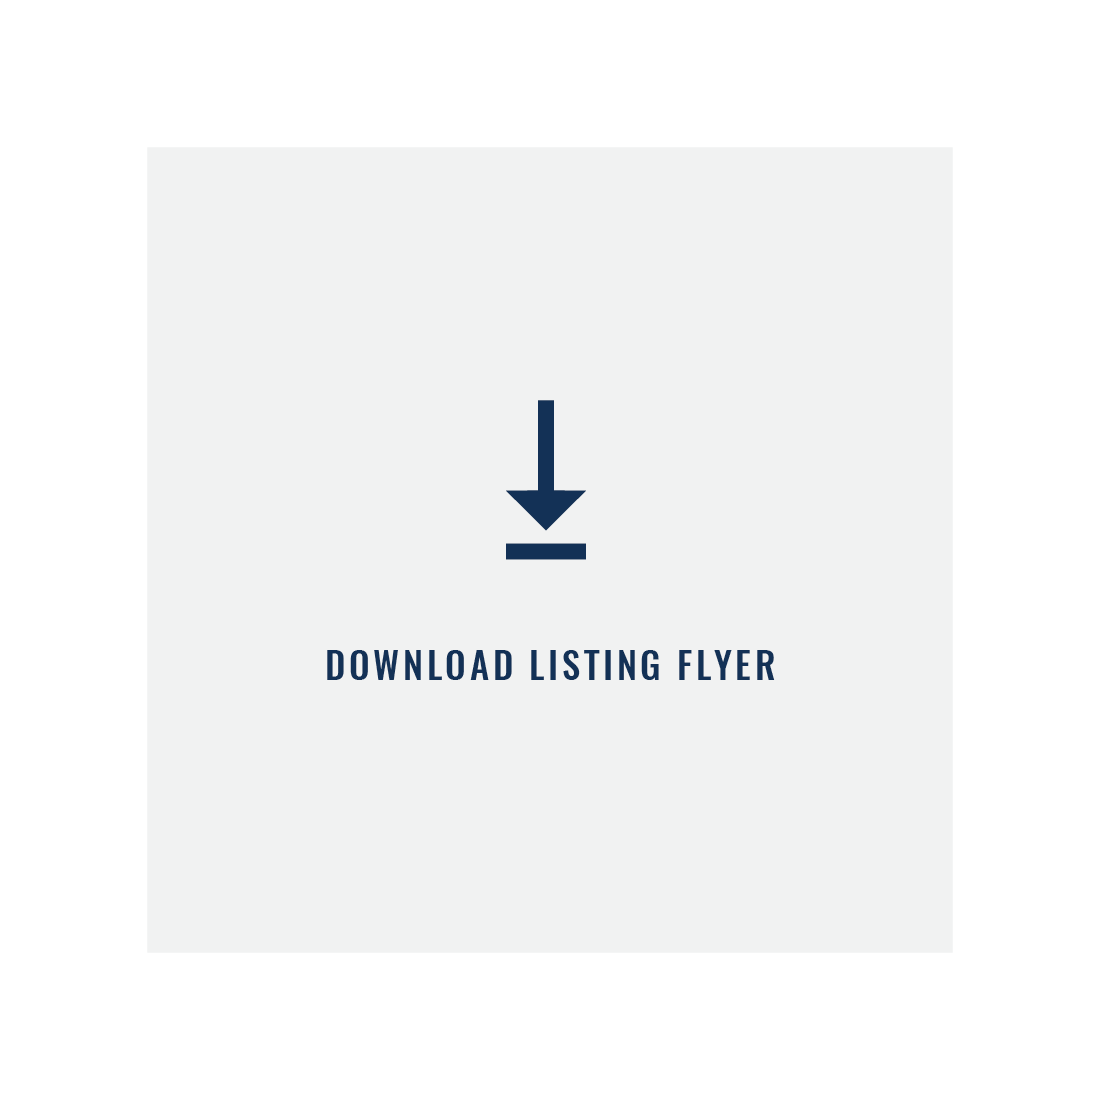 Download the Unit D East Wilbur Live/Work Listing Flyer